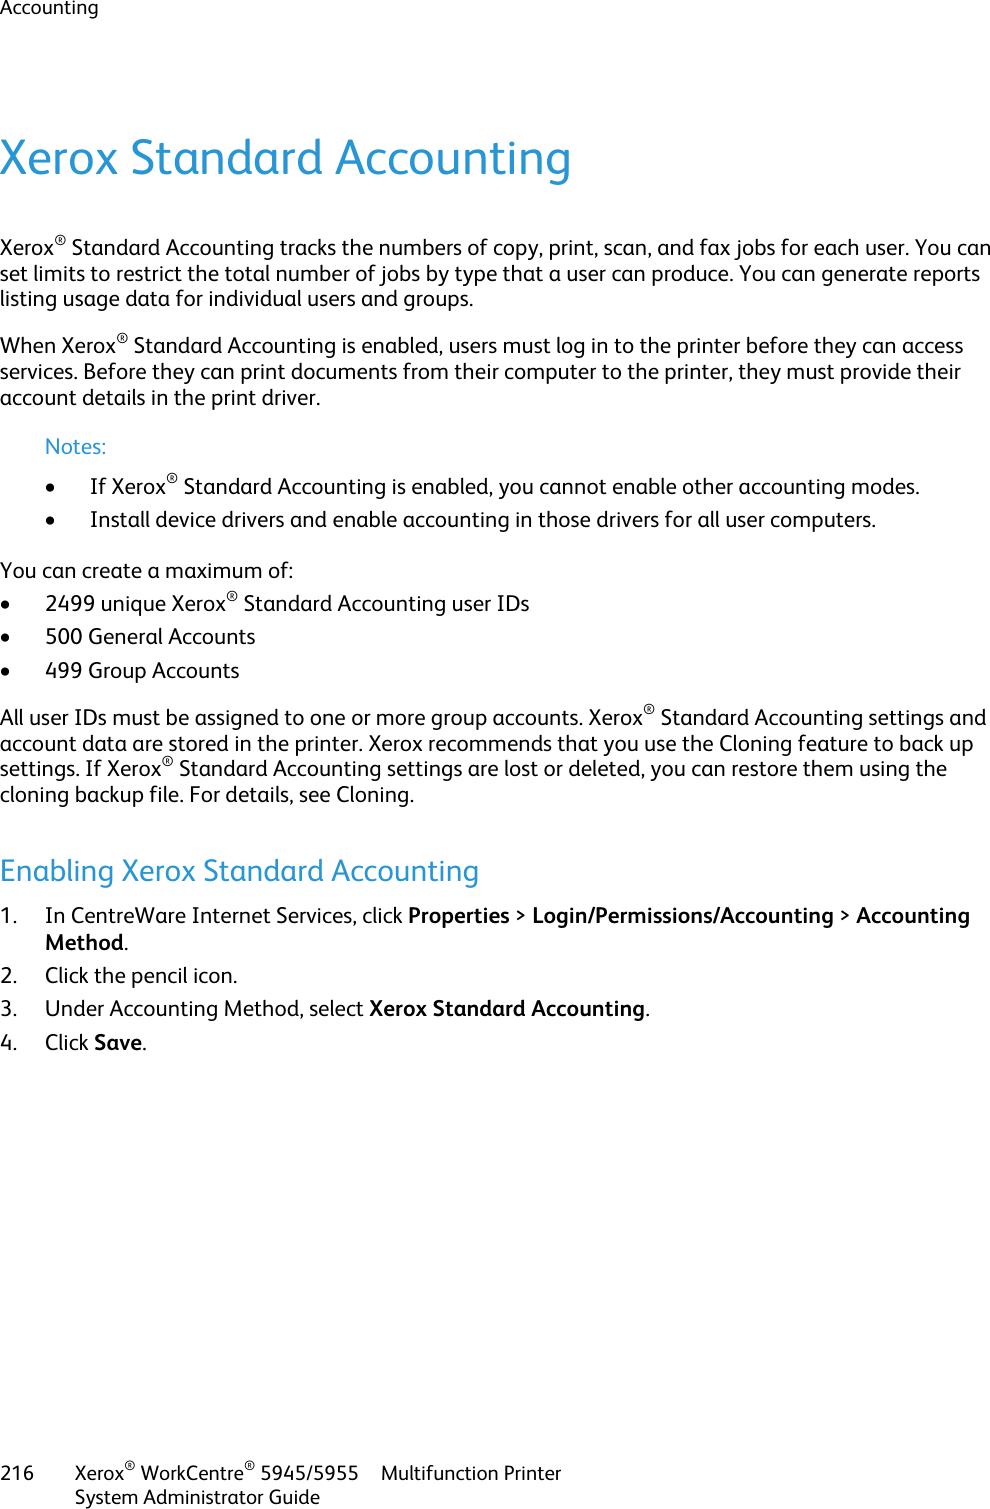 Xerox Workcentre 5945 5955 Administrators Guide Xerox® WorkCentre